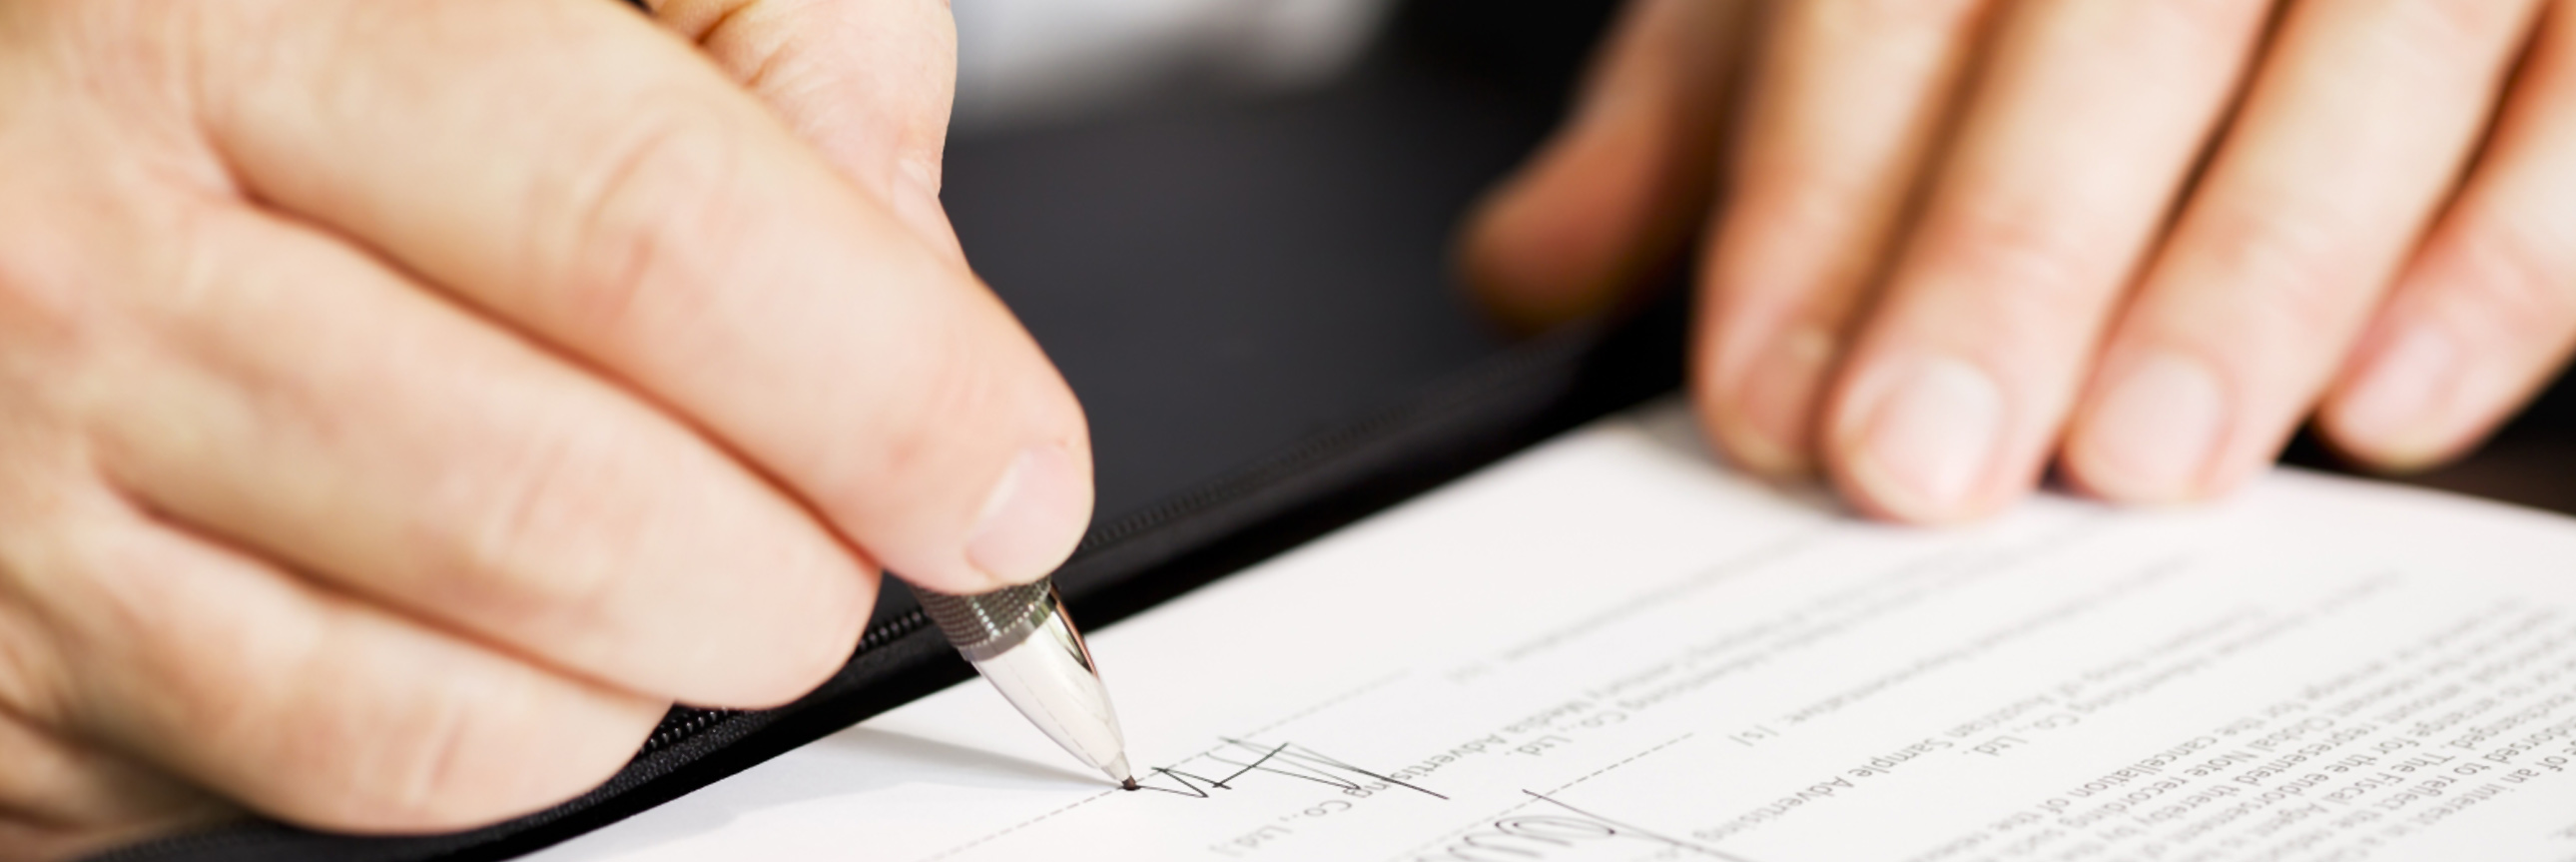 gente firmando documentos de contrato de vivienda